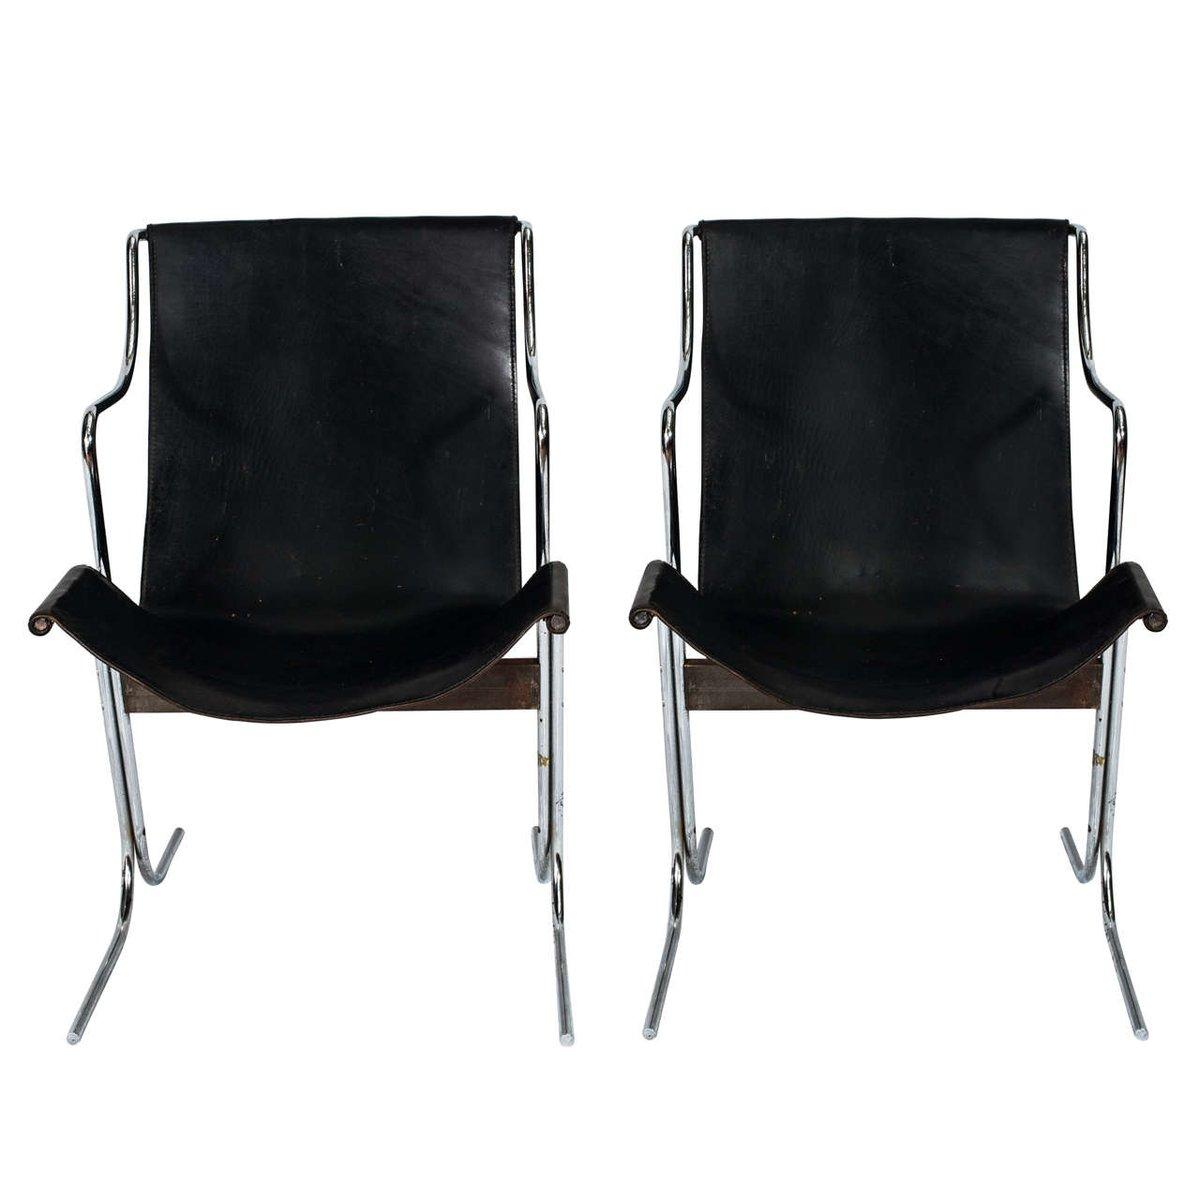 Italienische Designer Sessel Italienische Sessel Mit Pinkem